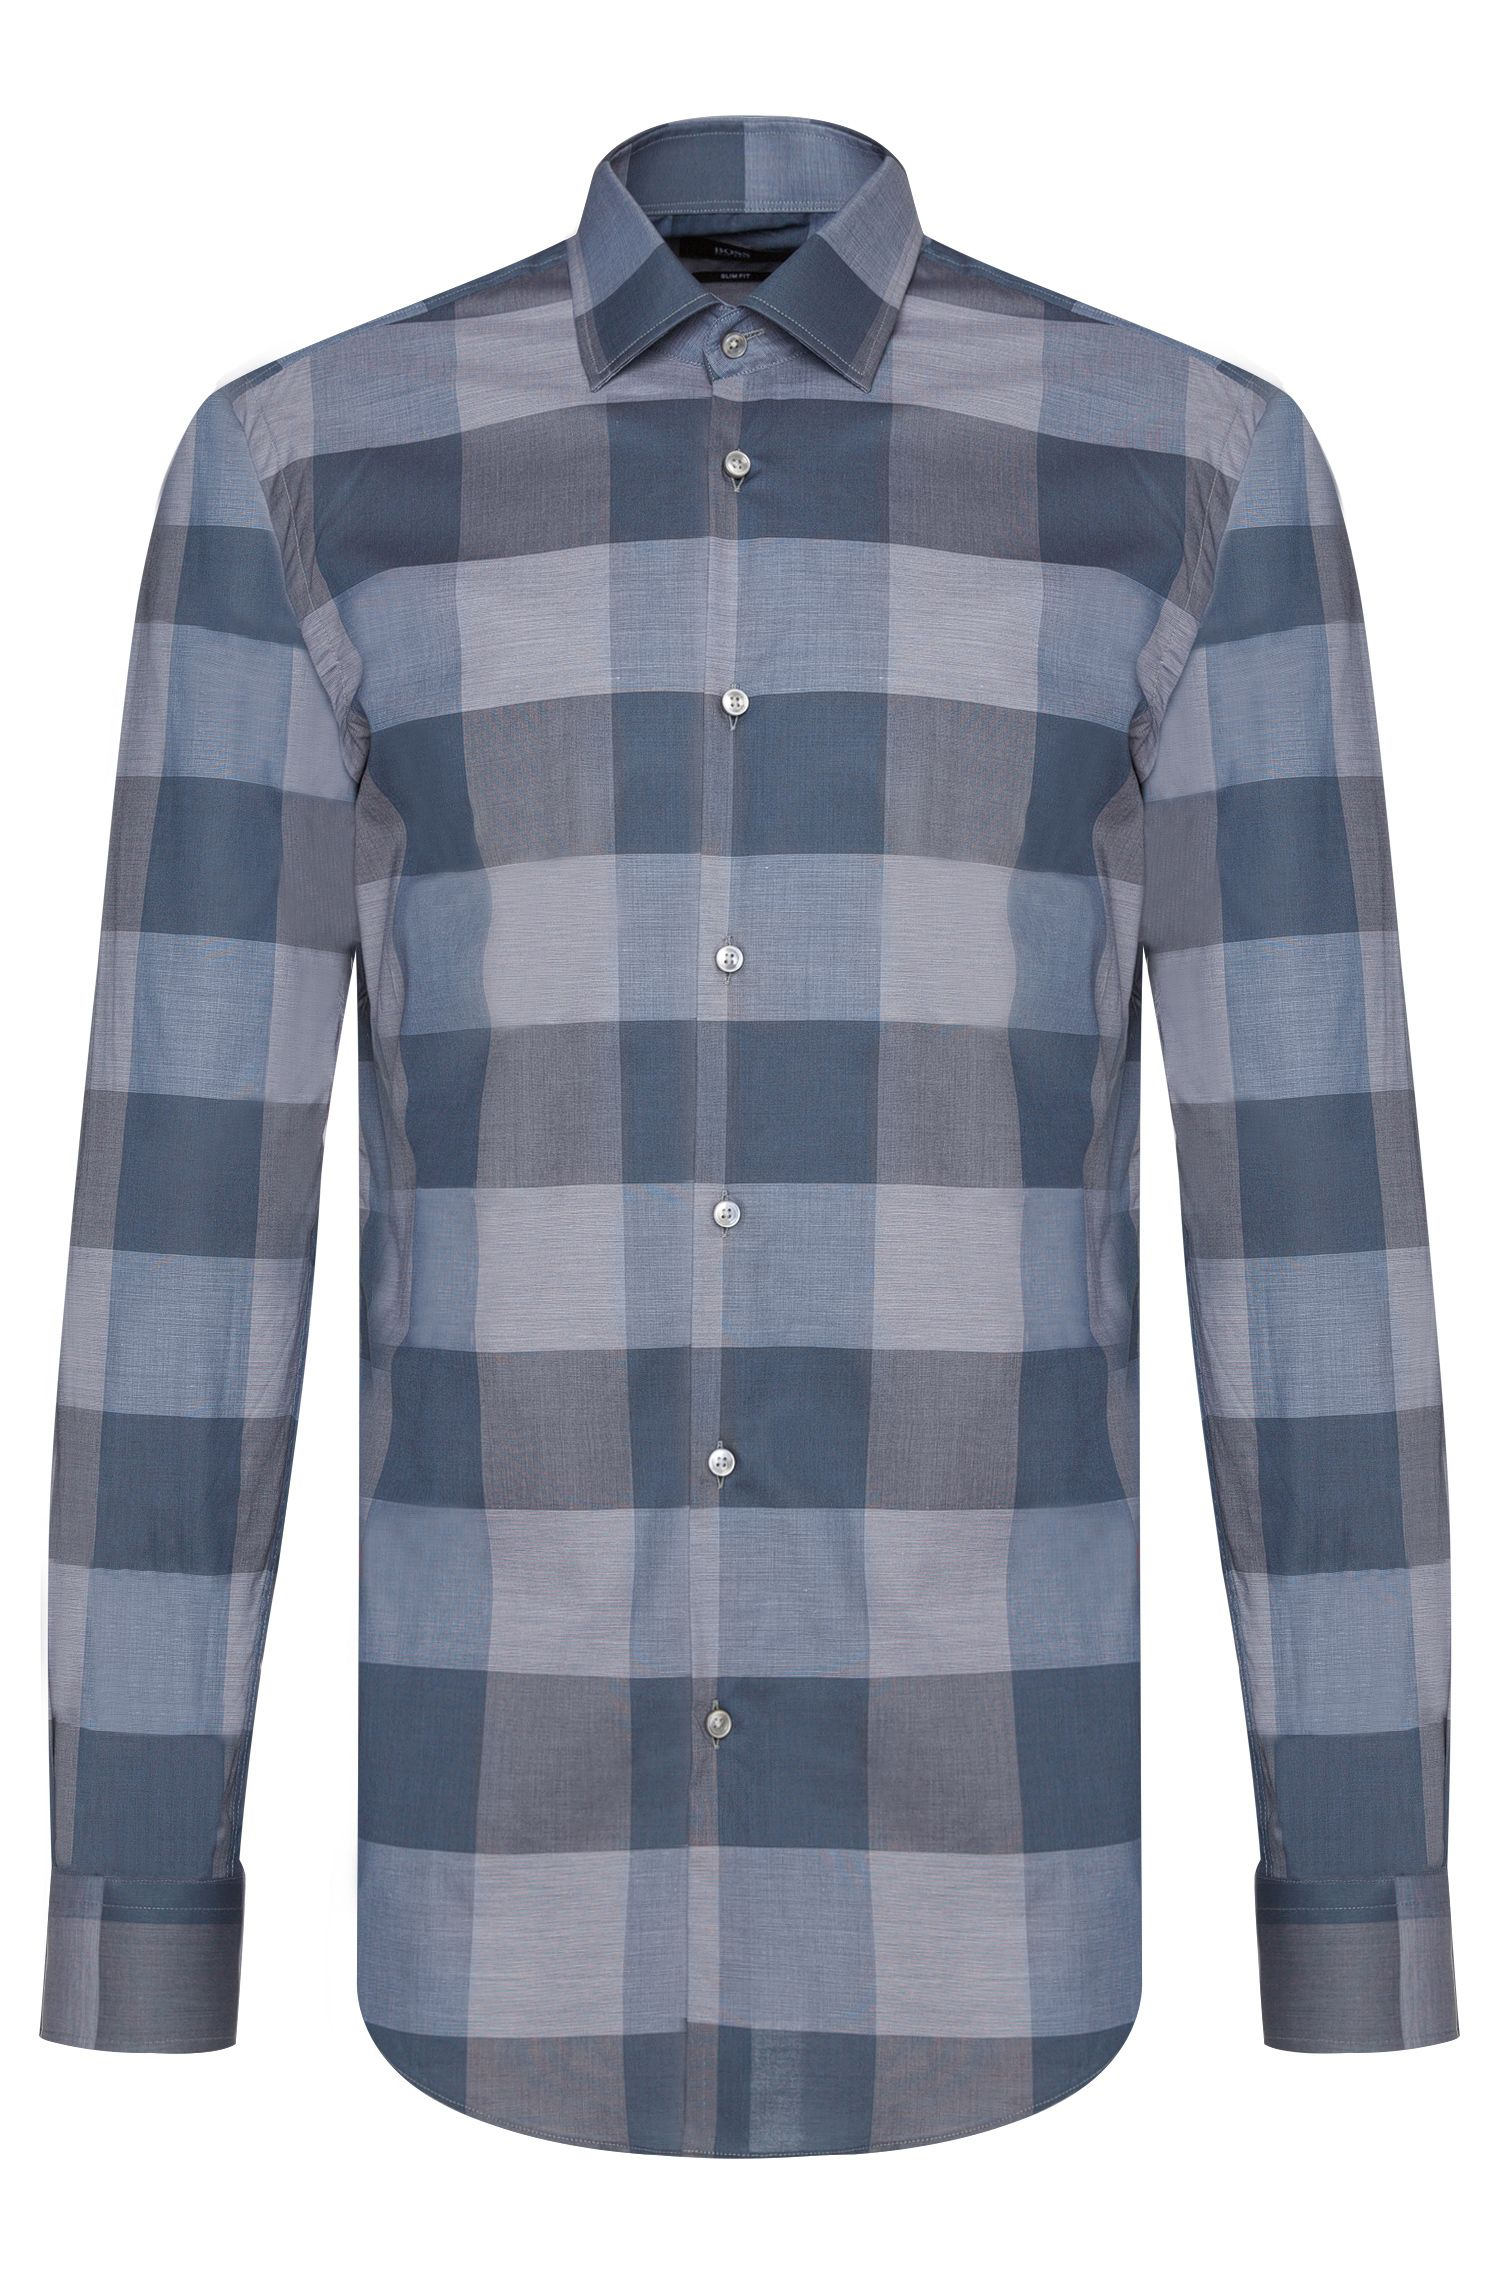 Oversized Check Italian Cotton Dress Shirt, Slim Fit | Jenno